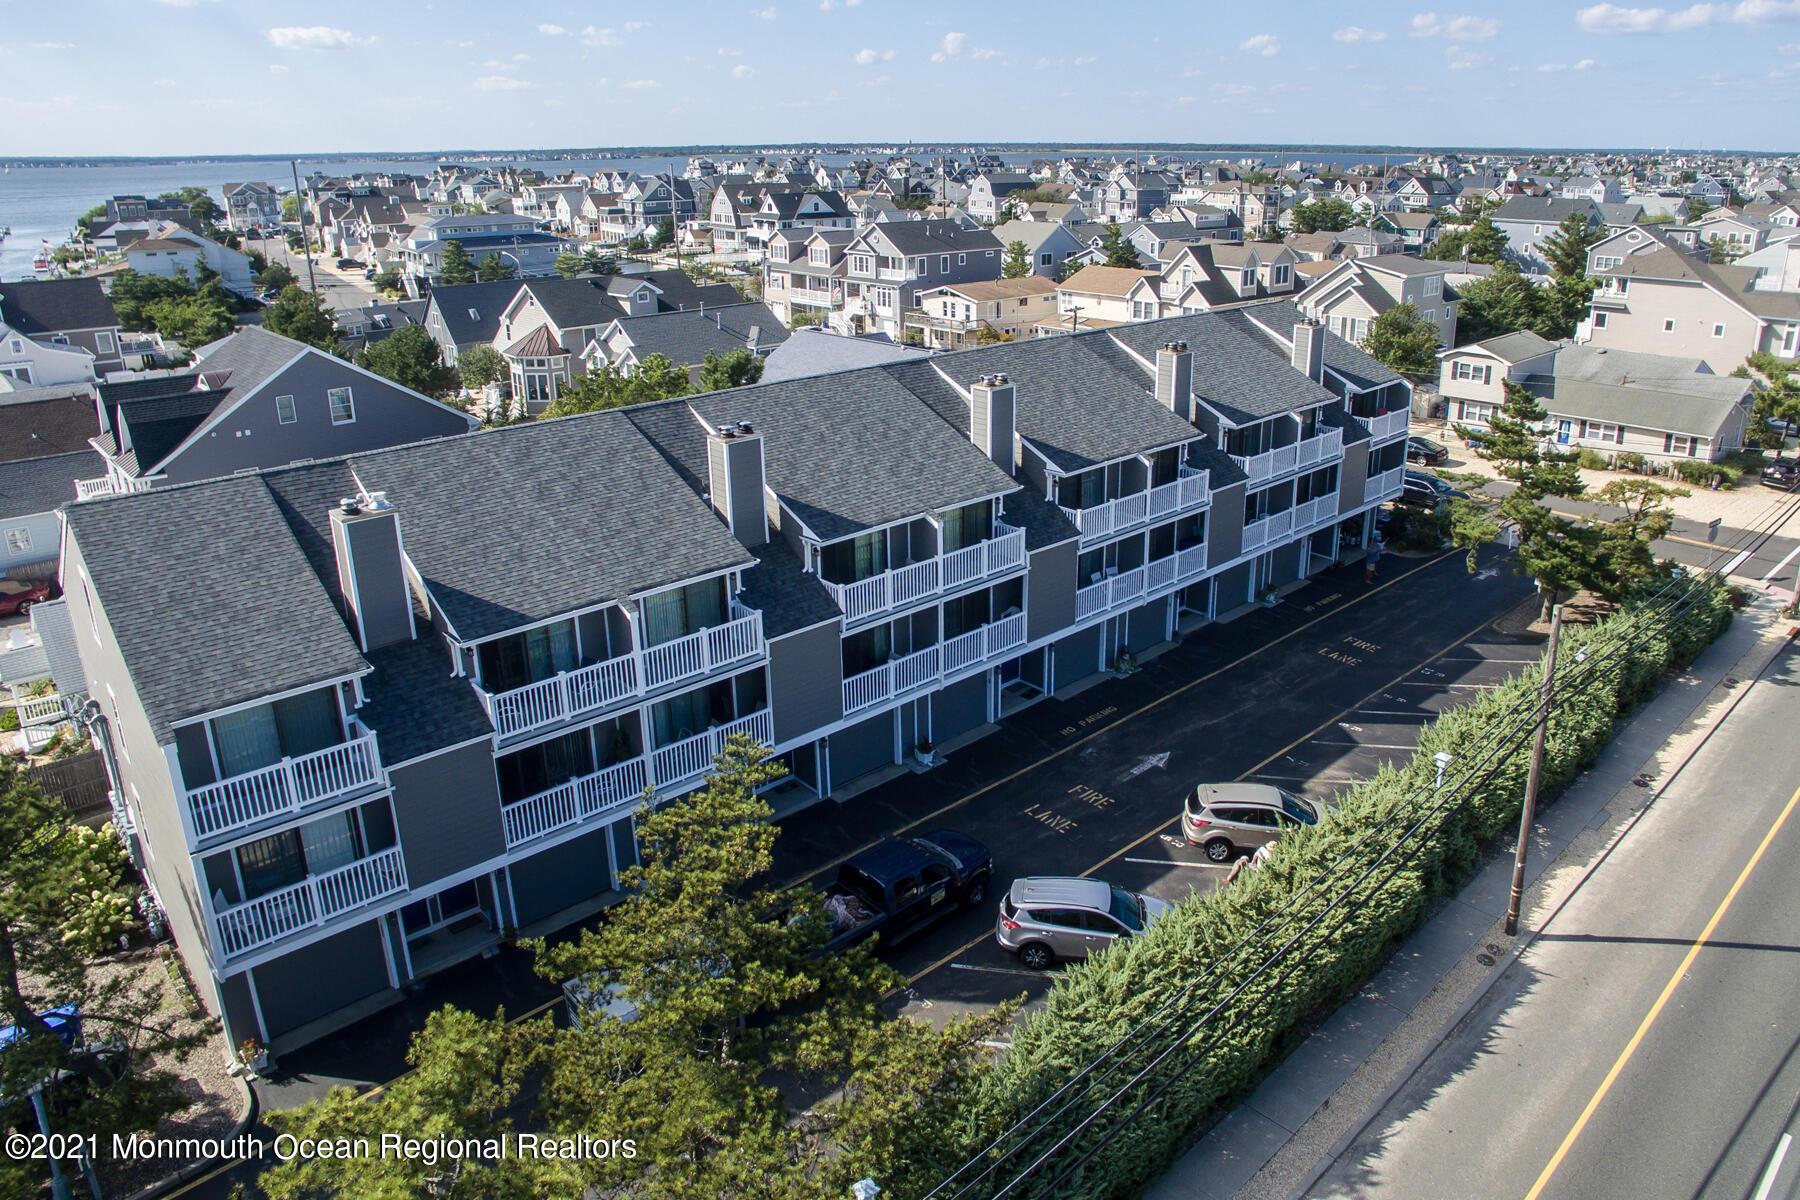 Photo of 3629 N Route 35 #9, Normandy Beach, NJ 08739